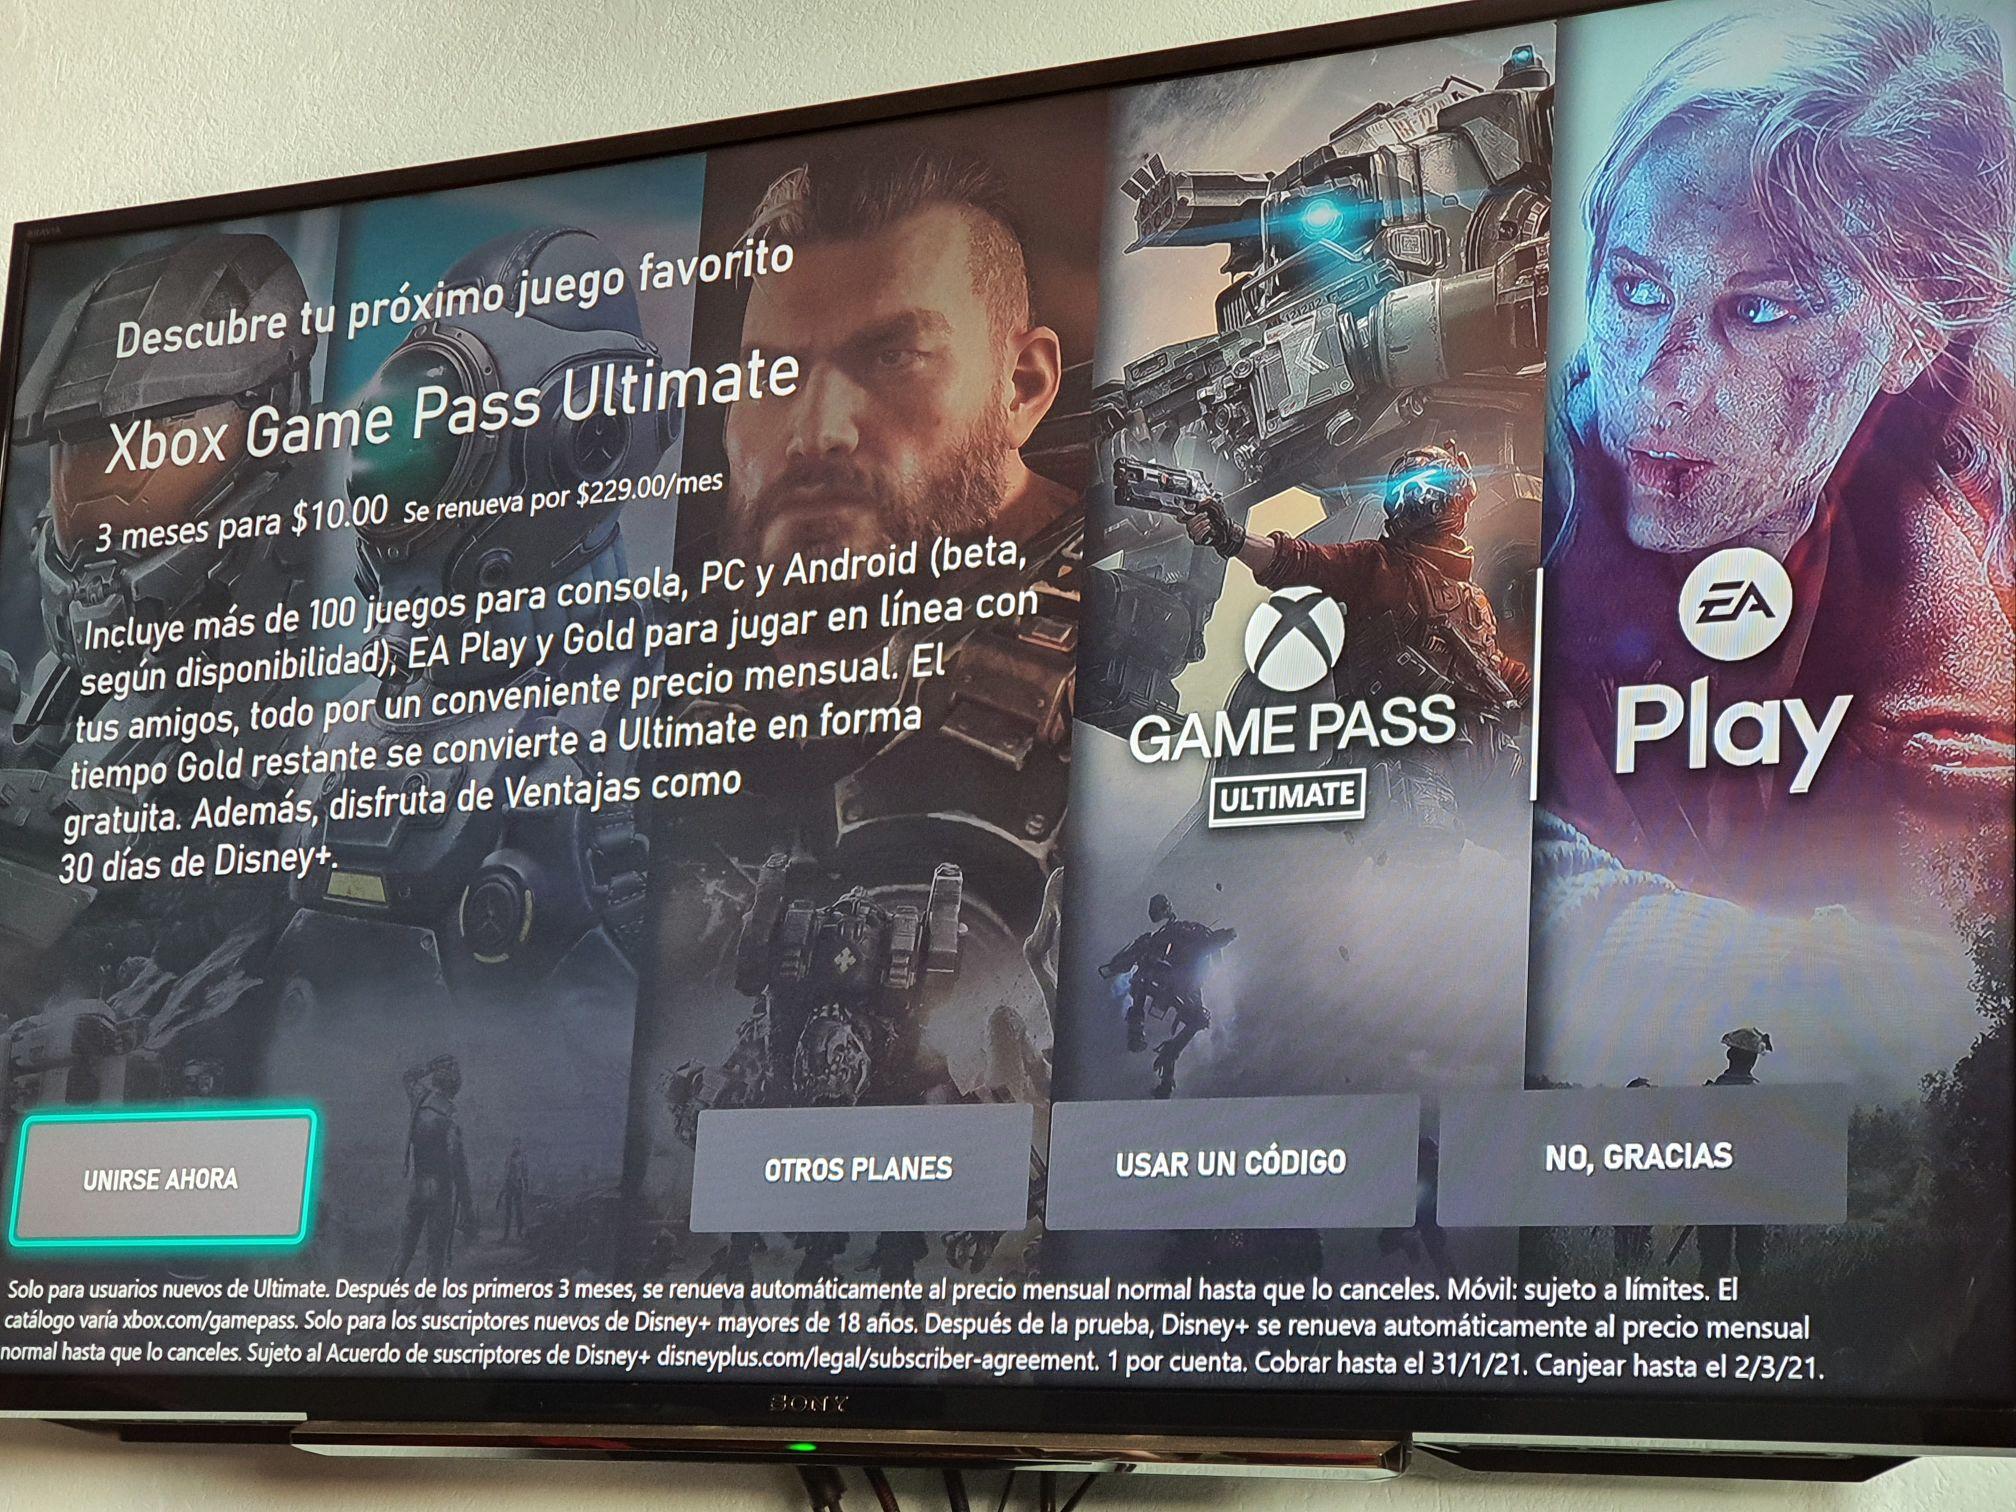 Xbox: game pass a solo 10 pesitos 3 meses